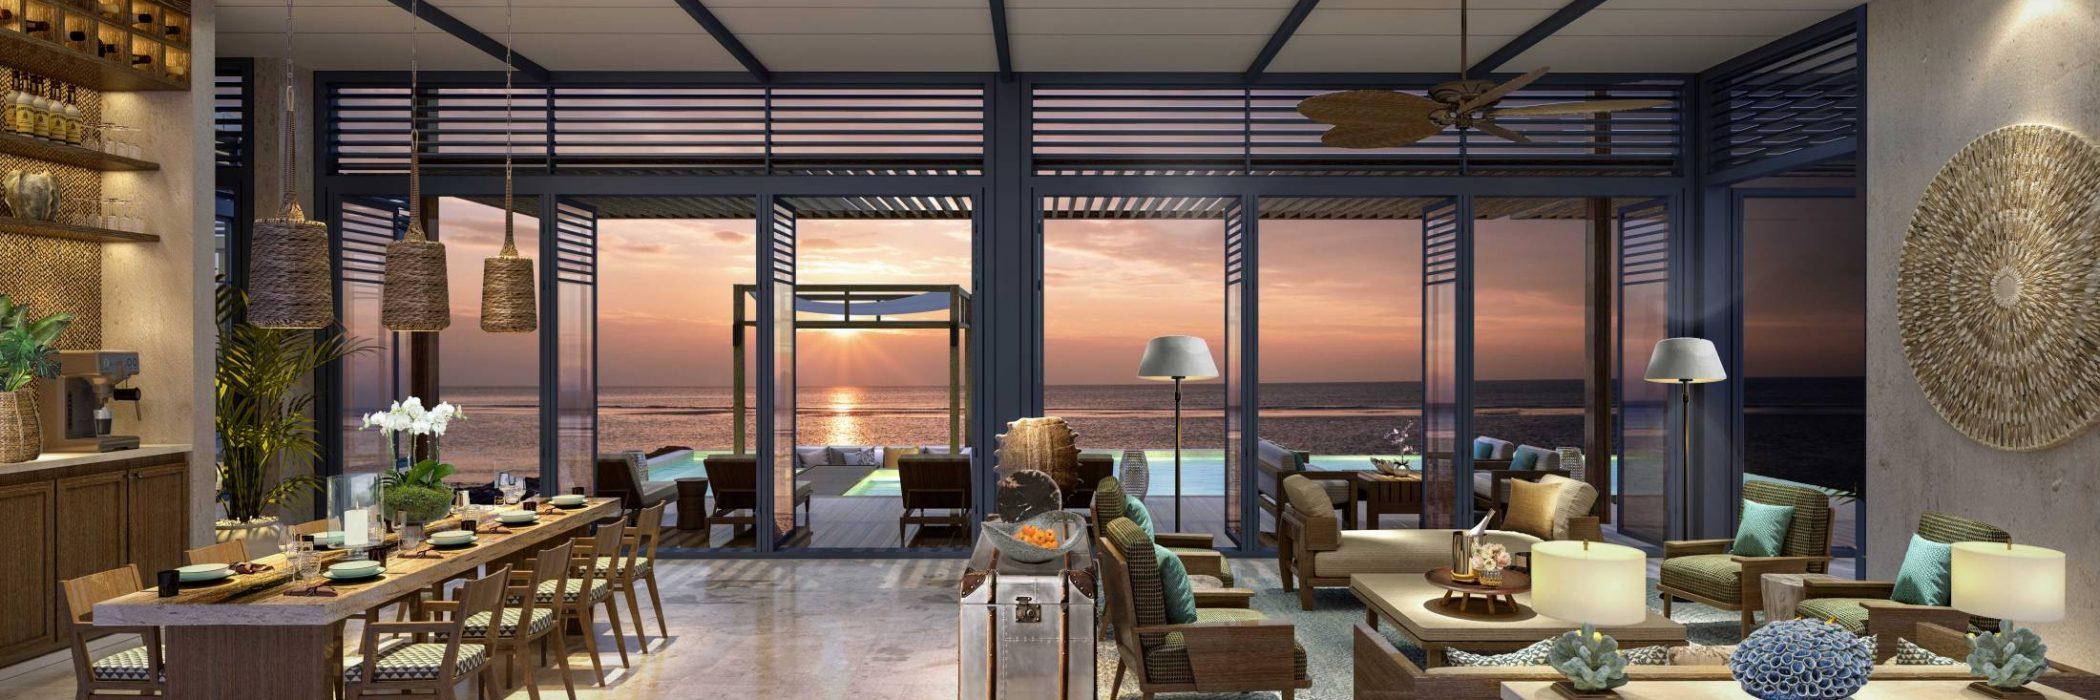 Raffles Maldives Meradhoo - Introducing Raffles Royal Residence – Indian Ocean's new island hideaway